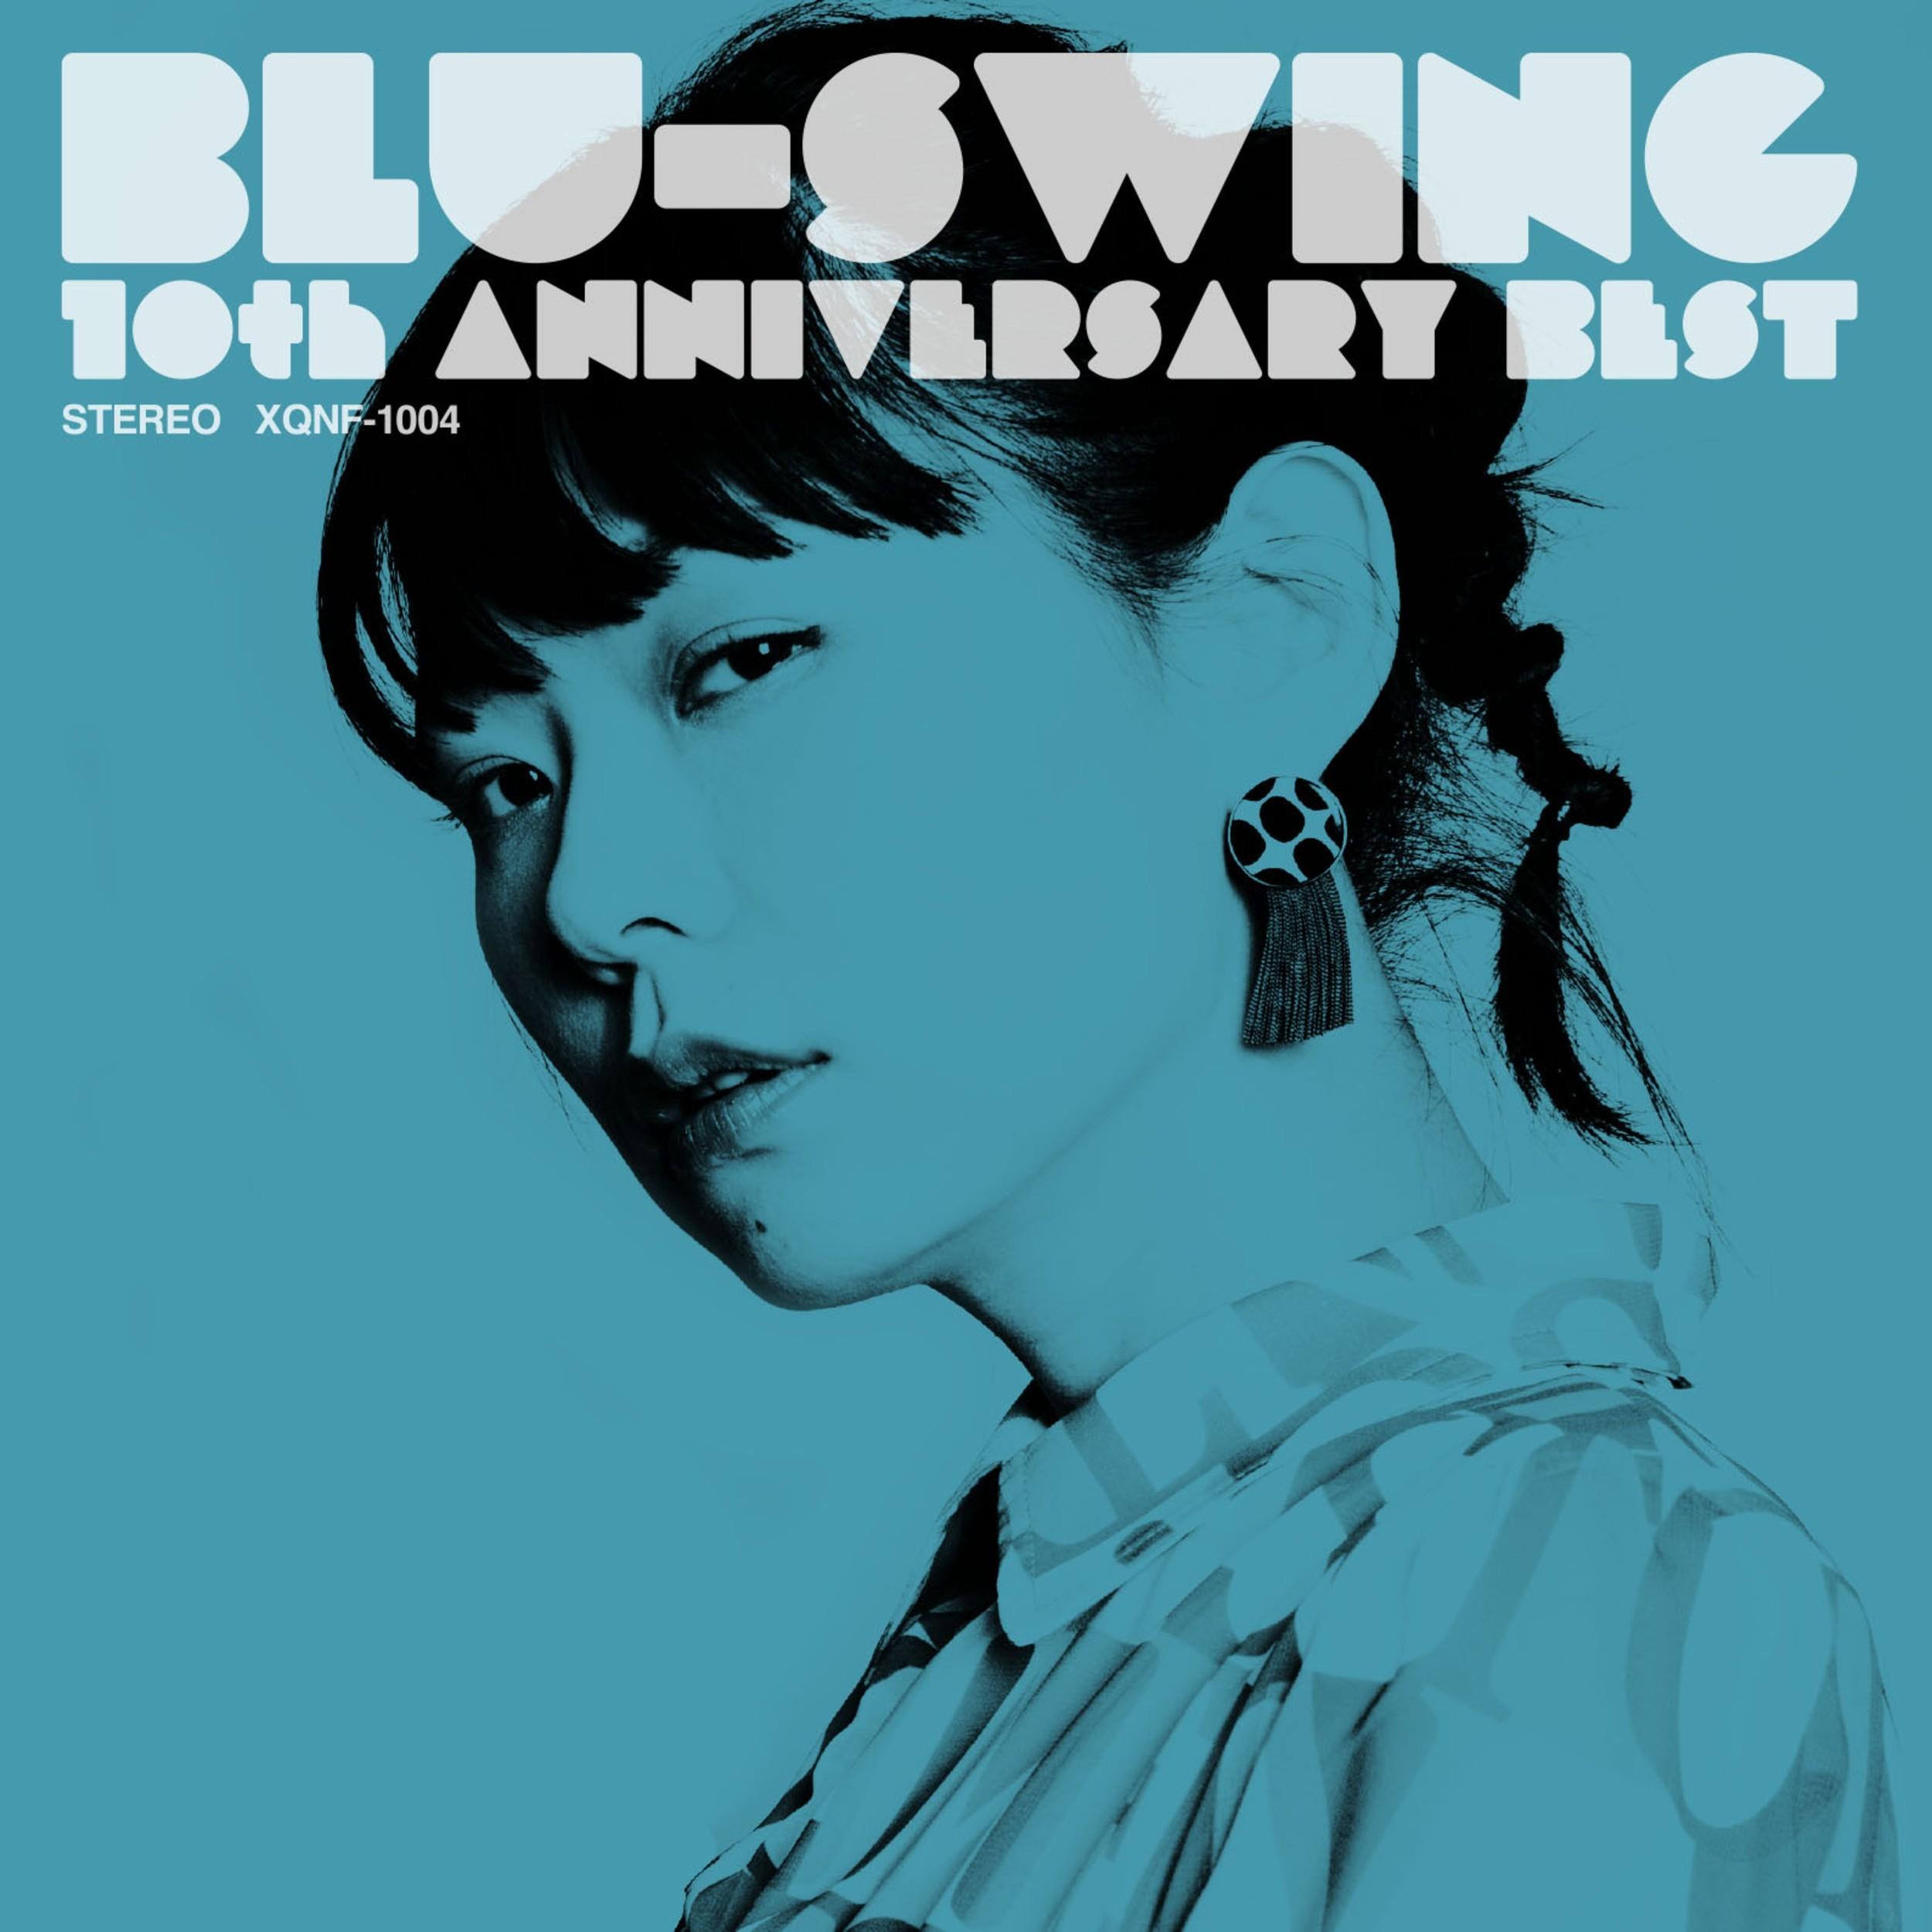 BLU-SWING – BLU-SWING 10th ANNIVERSARY BEST [FLAC / WEB] [2019.05.08]